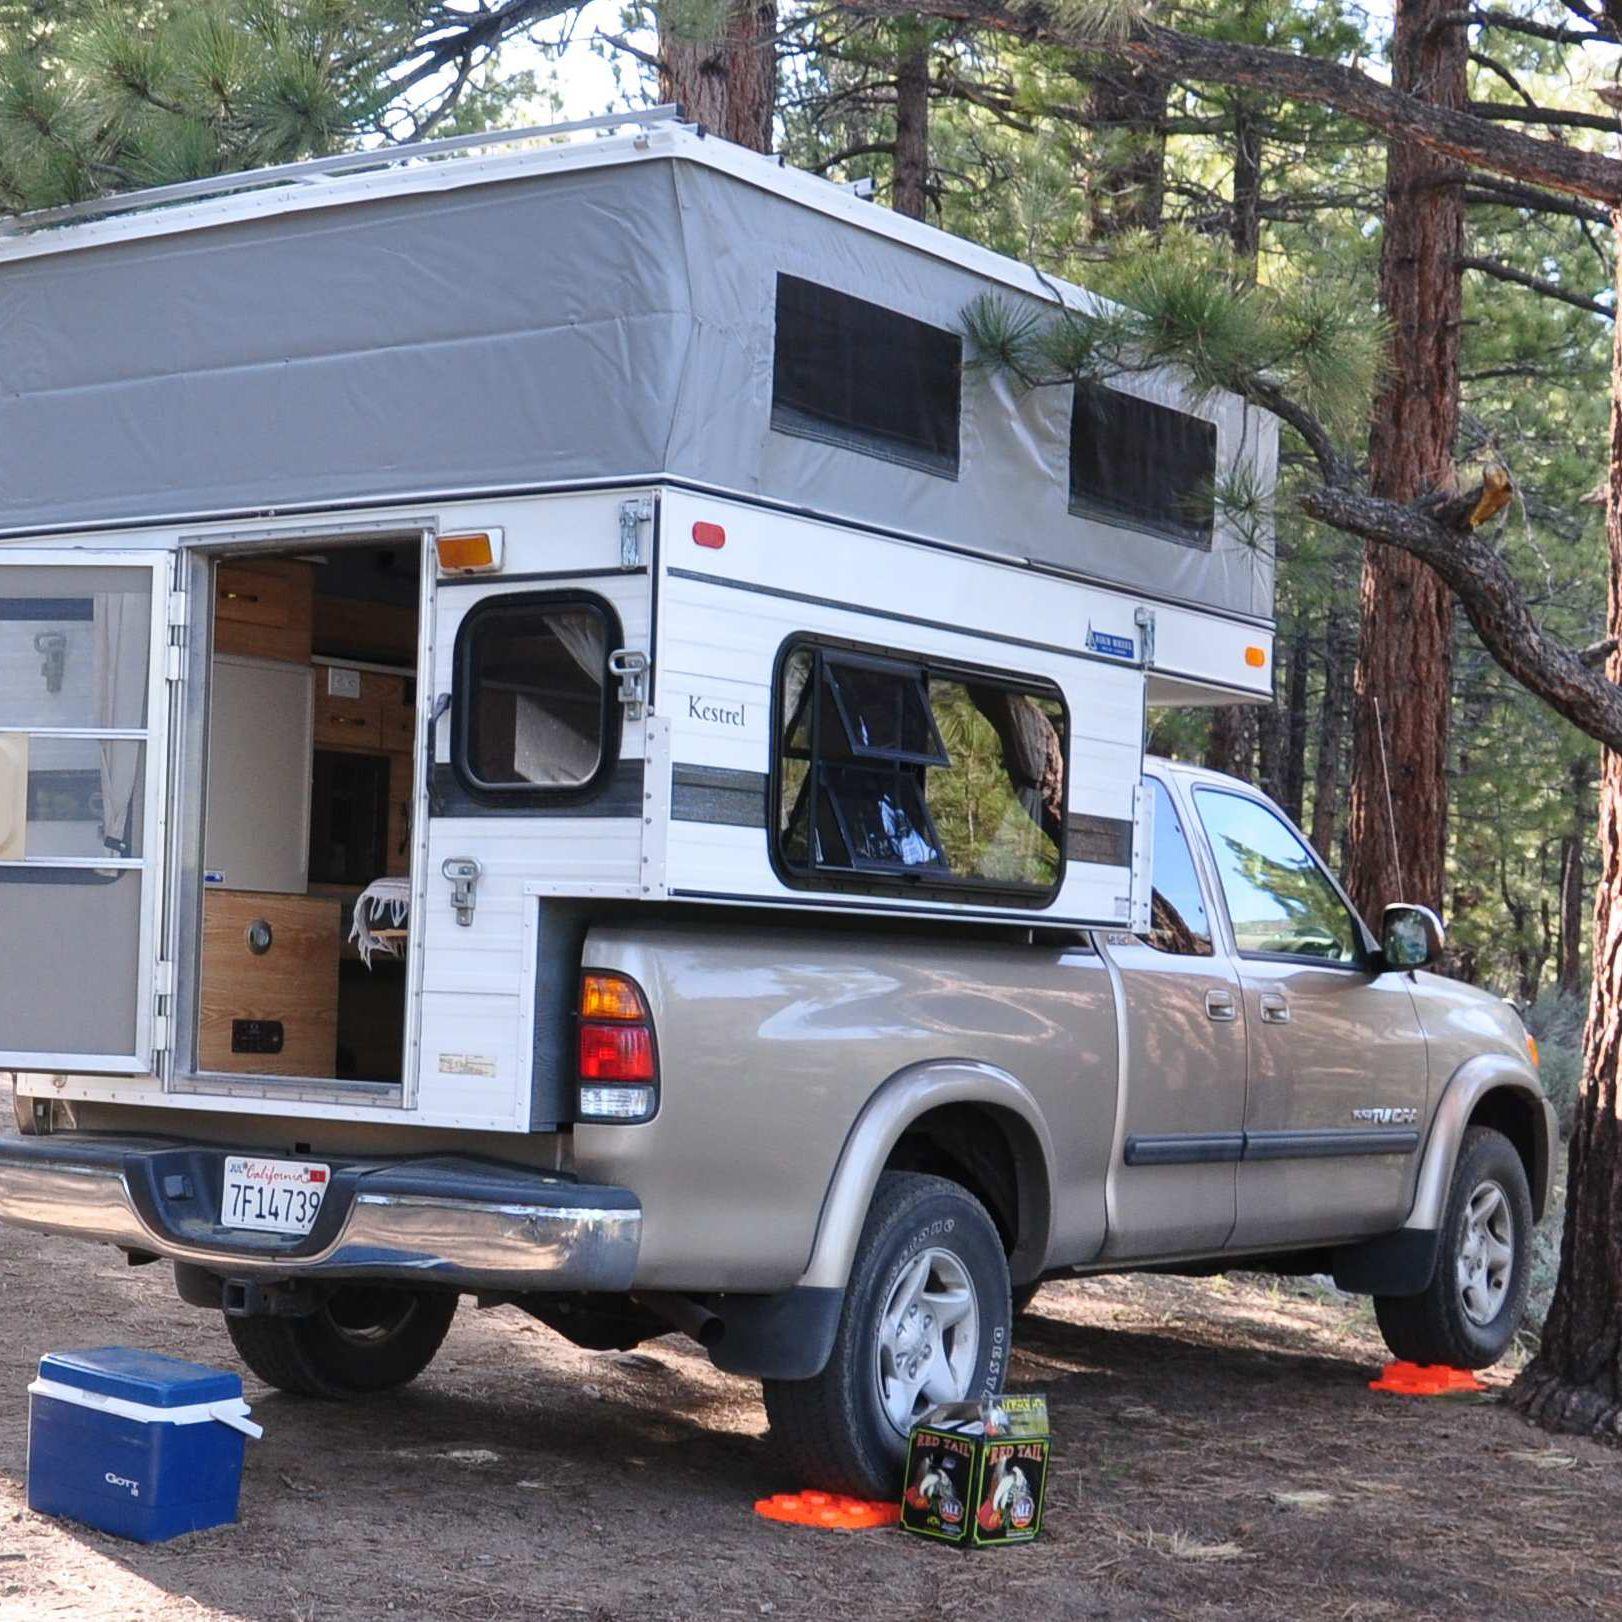 Four Wheel Pop-up Camper: Hawk (or Kestrel) Model